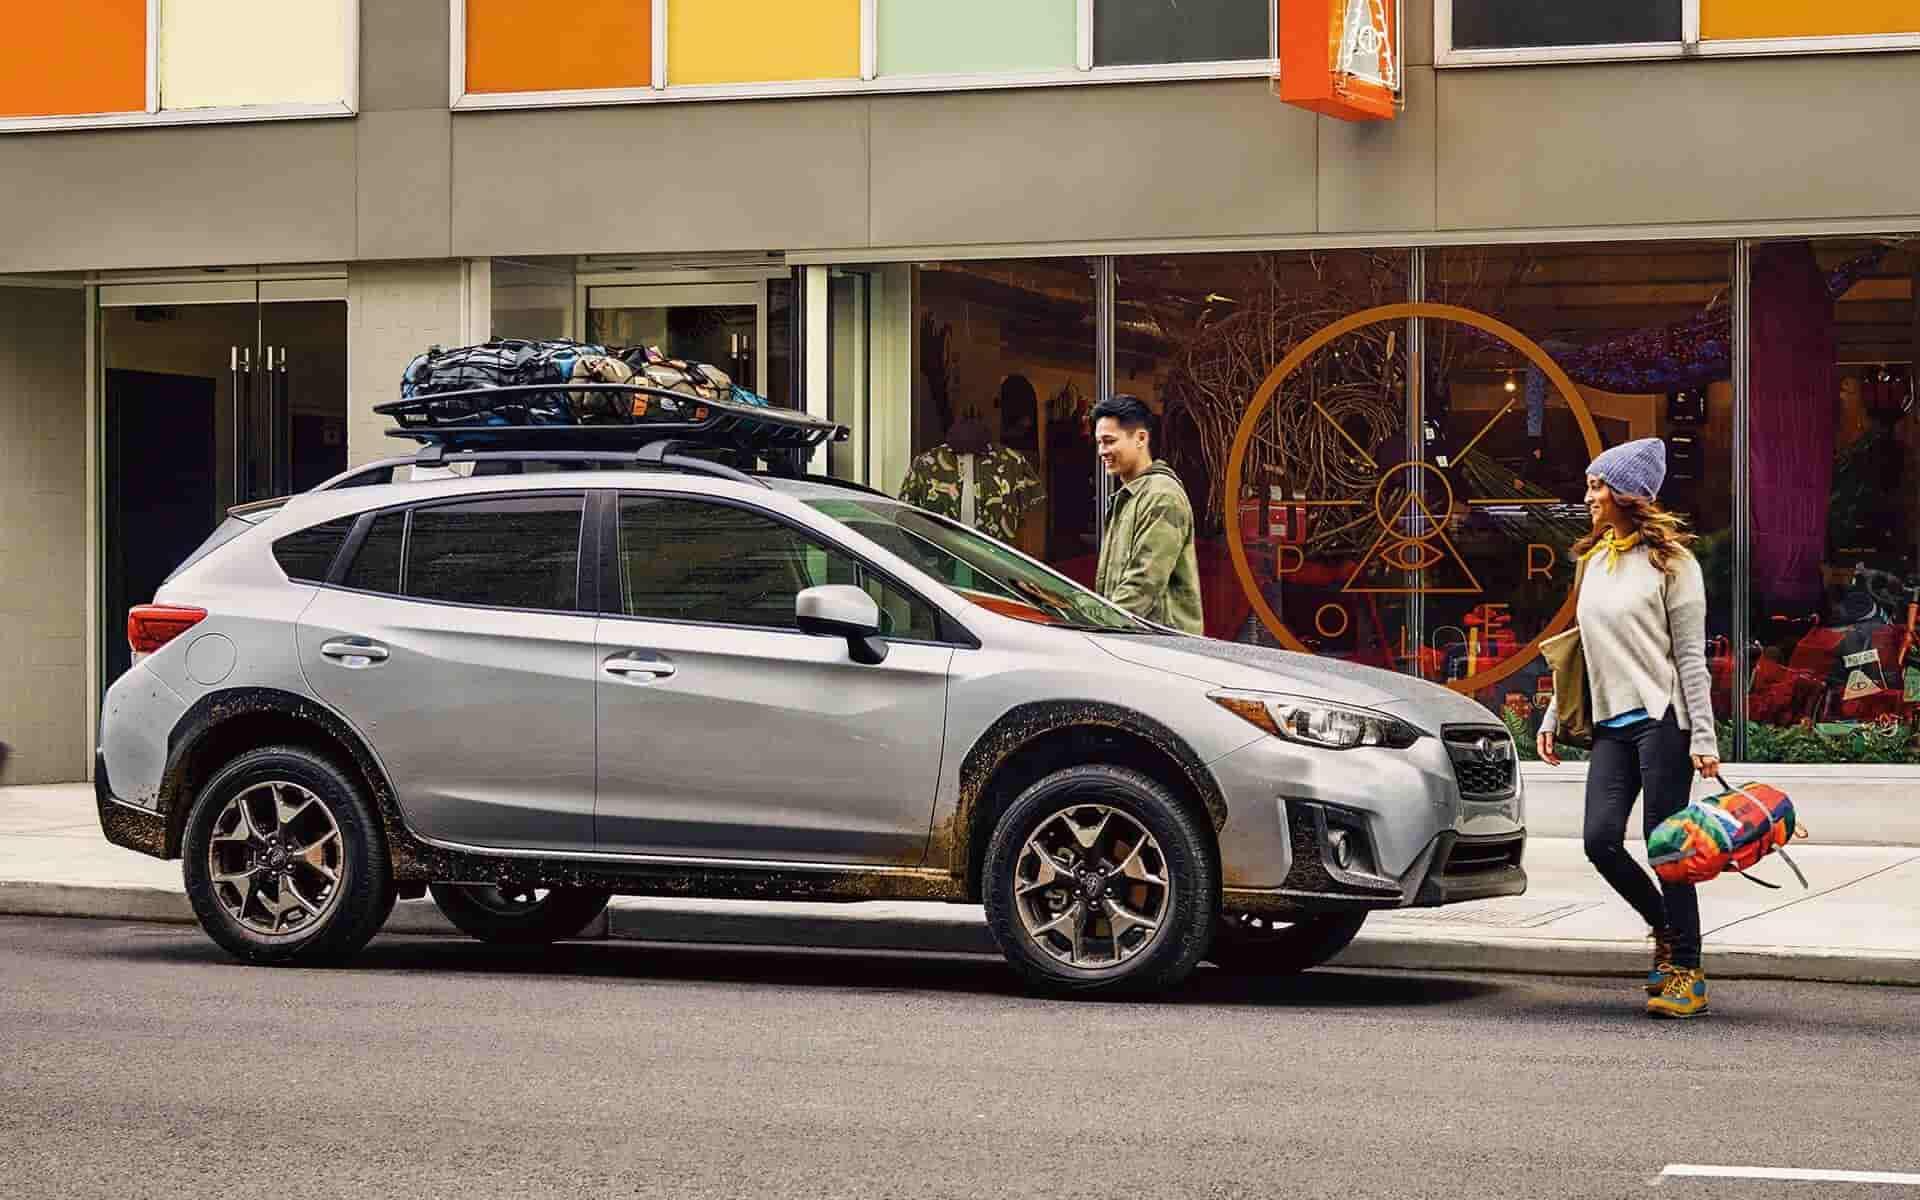 Explore the 2020 Subaru Crosstrek near Bingham Farms MI